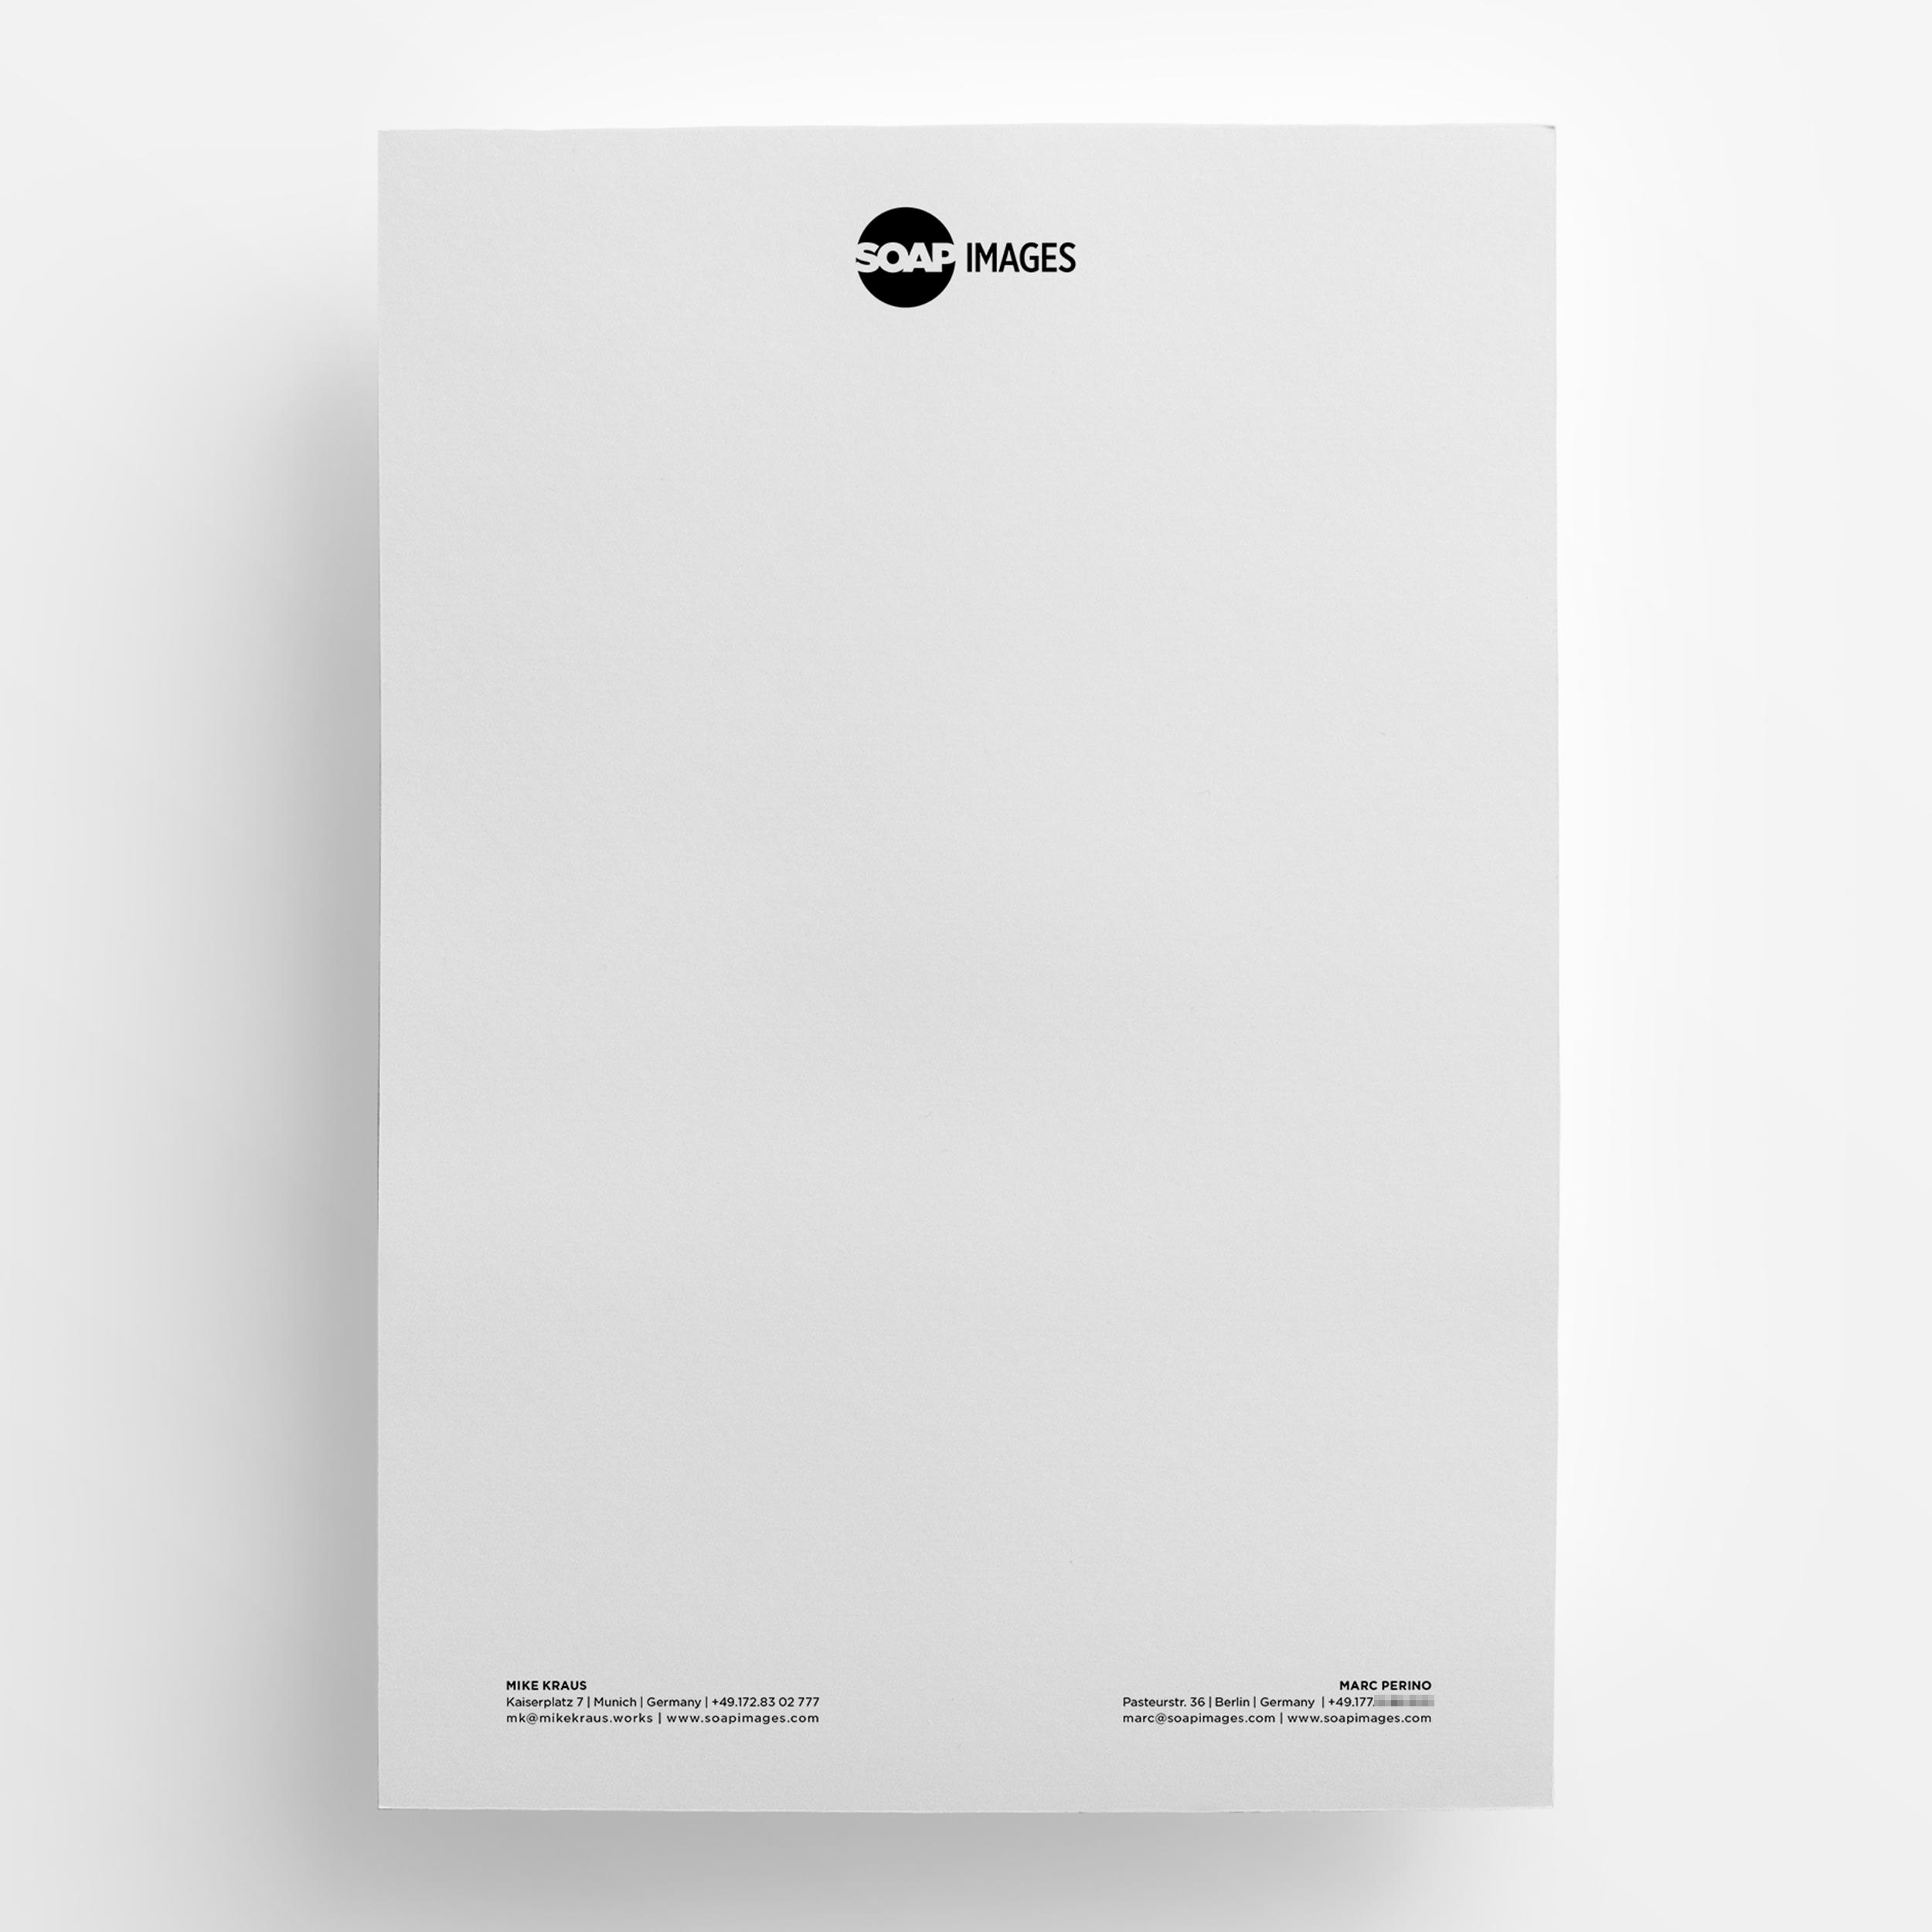 SOAP-IMAGES_Briefkopf_2500.jpg